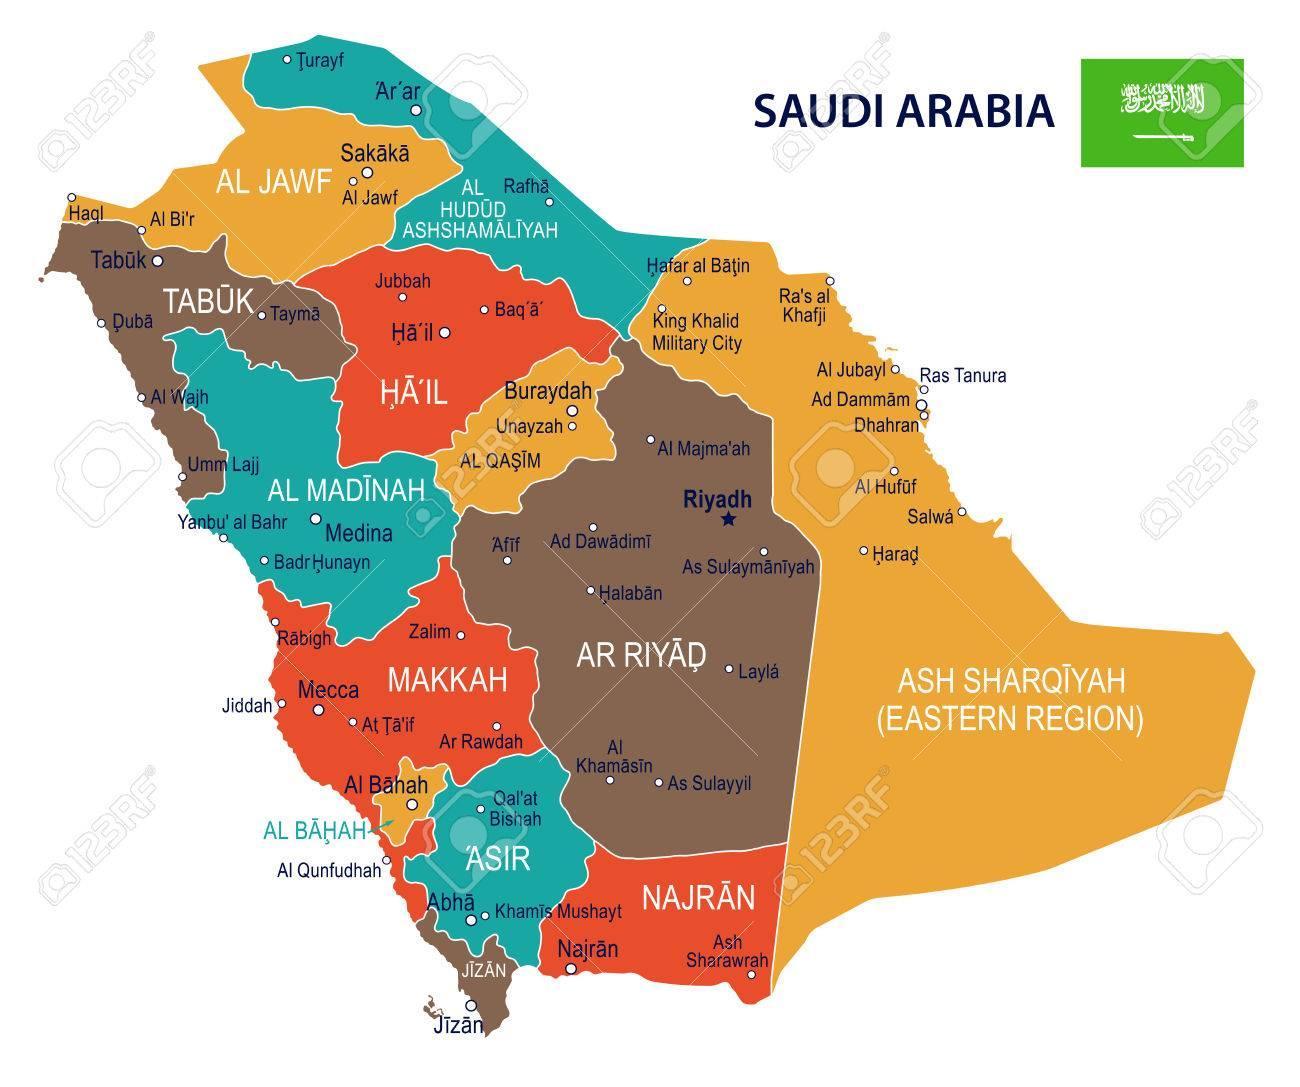 Saudi Arabia Map And Flag - Vector Illustration Royalty Free ...